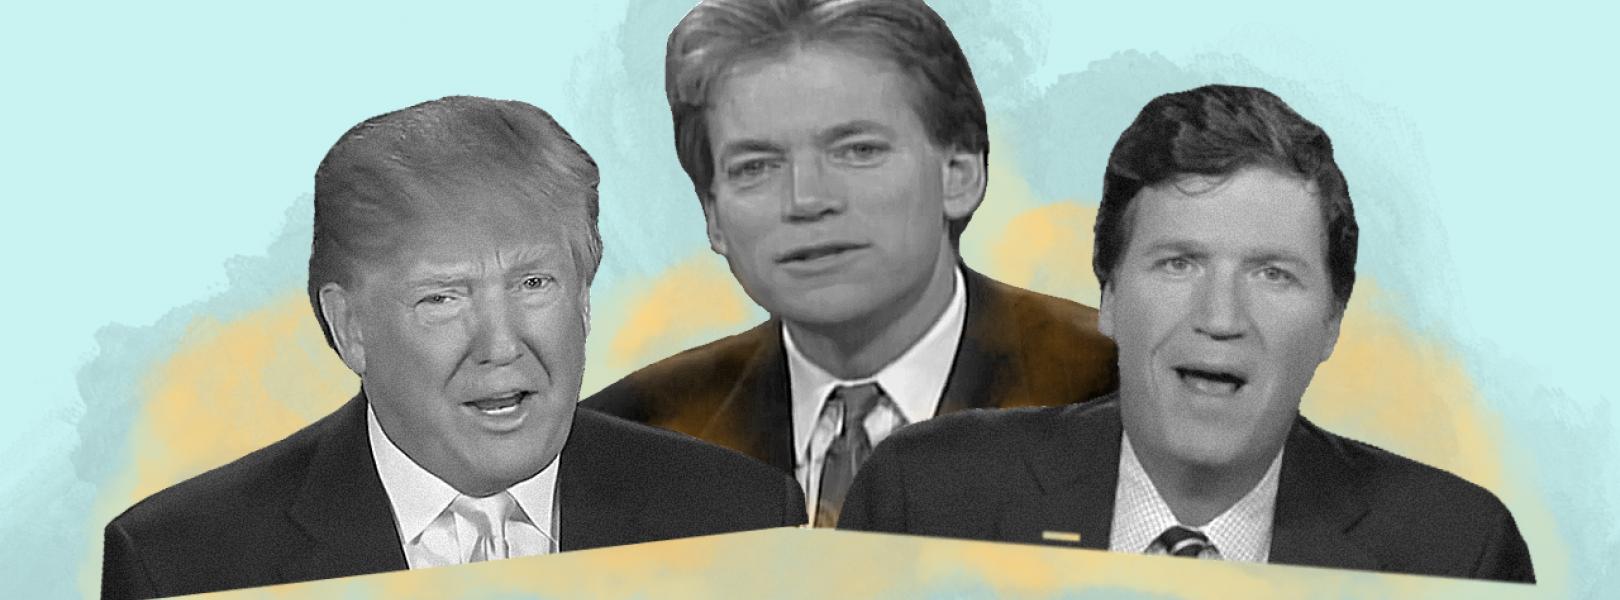 David Duke, Tucker Carlson, Donald Trump